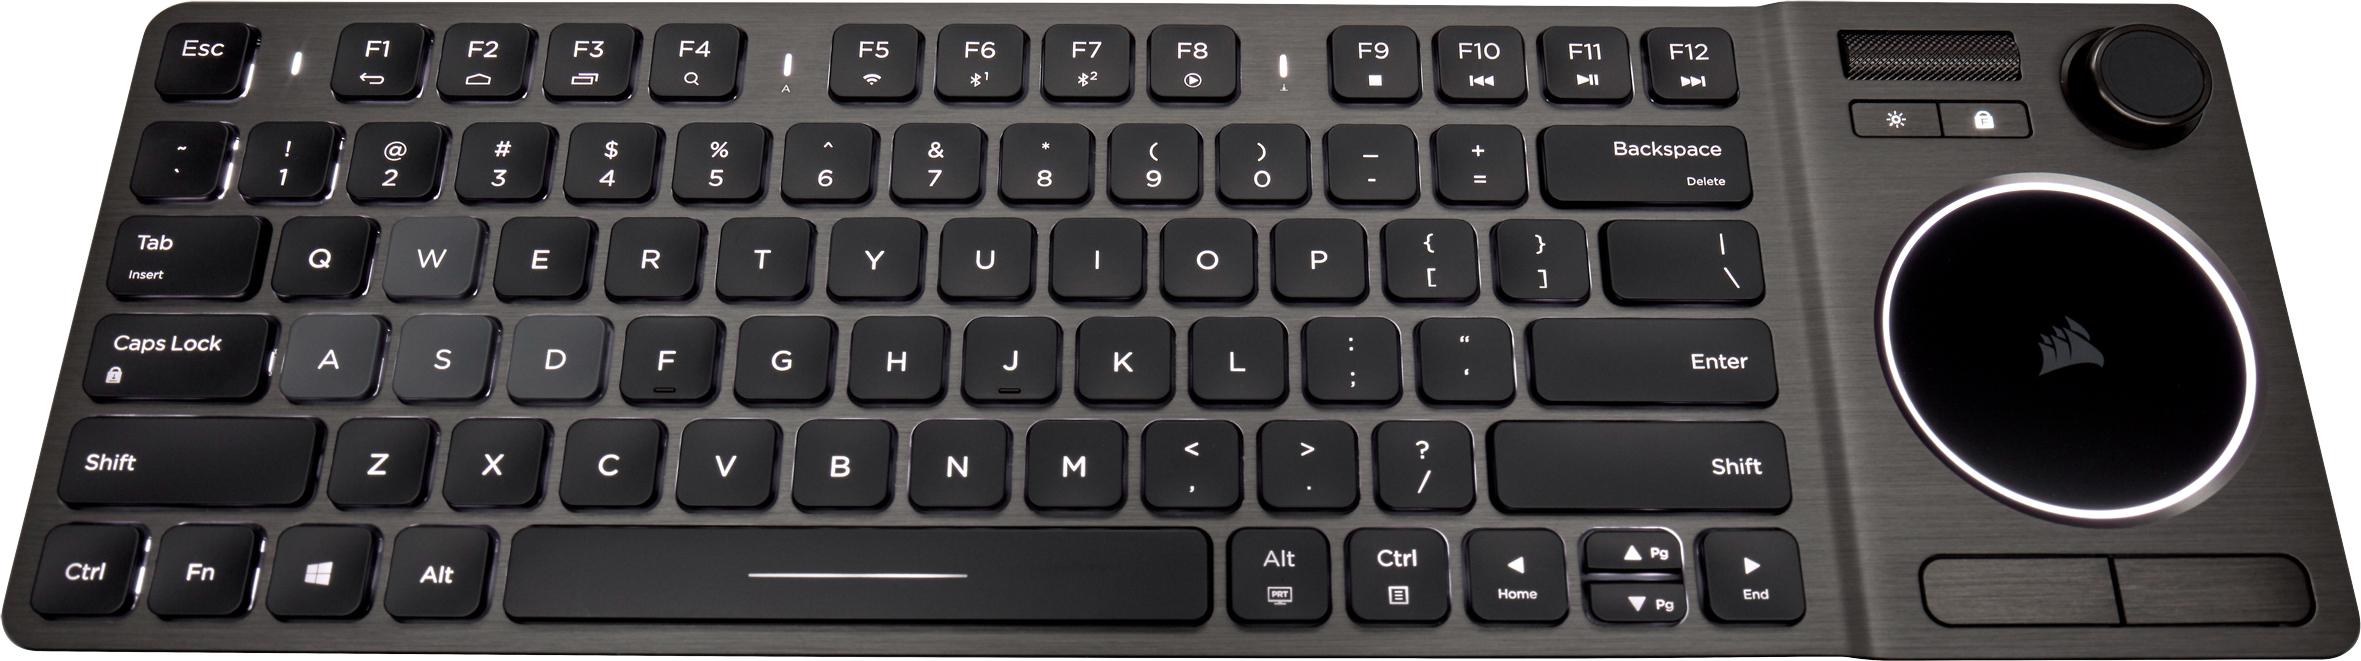 Corsair Announces K83 Wireless Entertainment Keyboard for